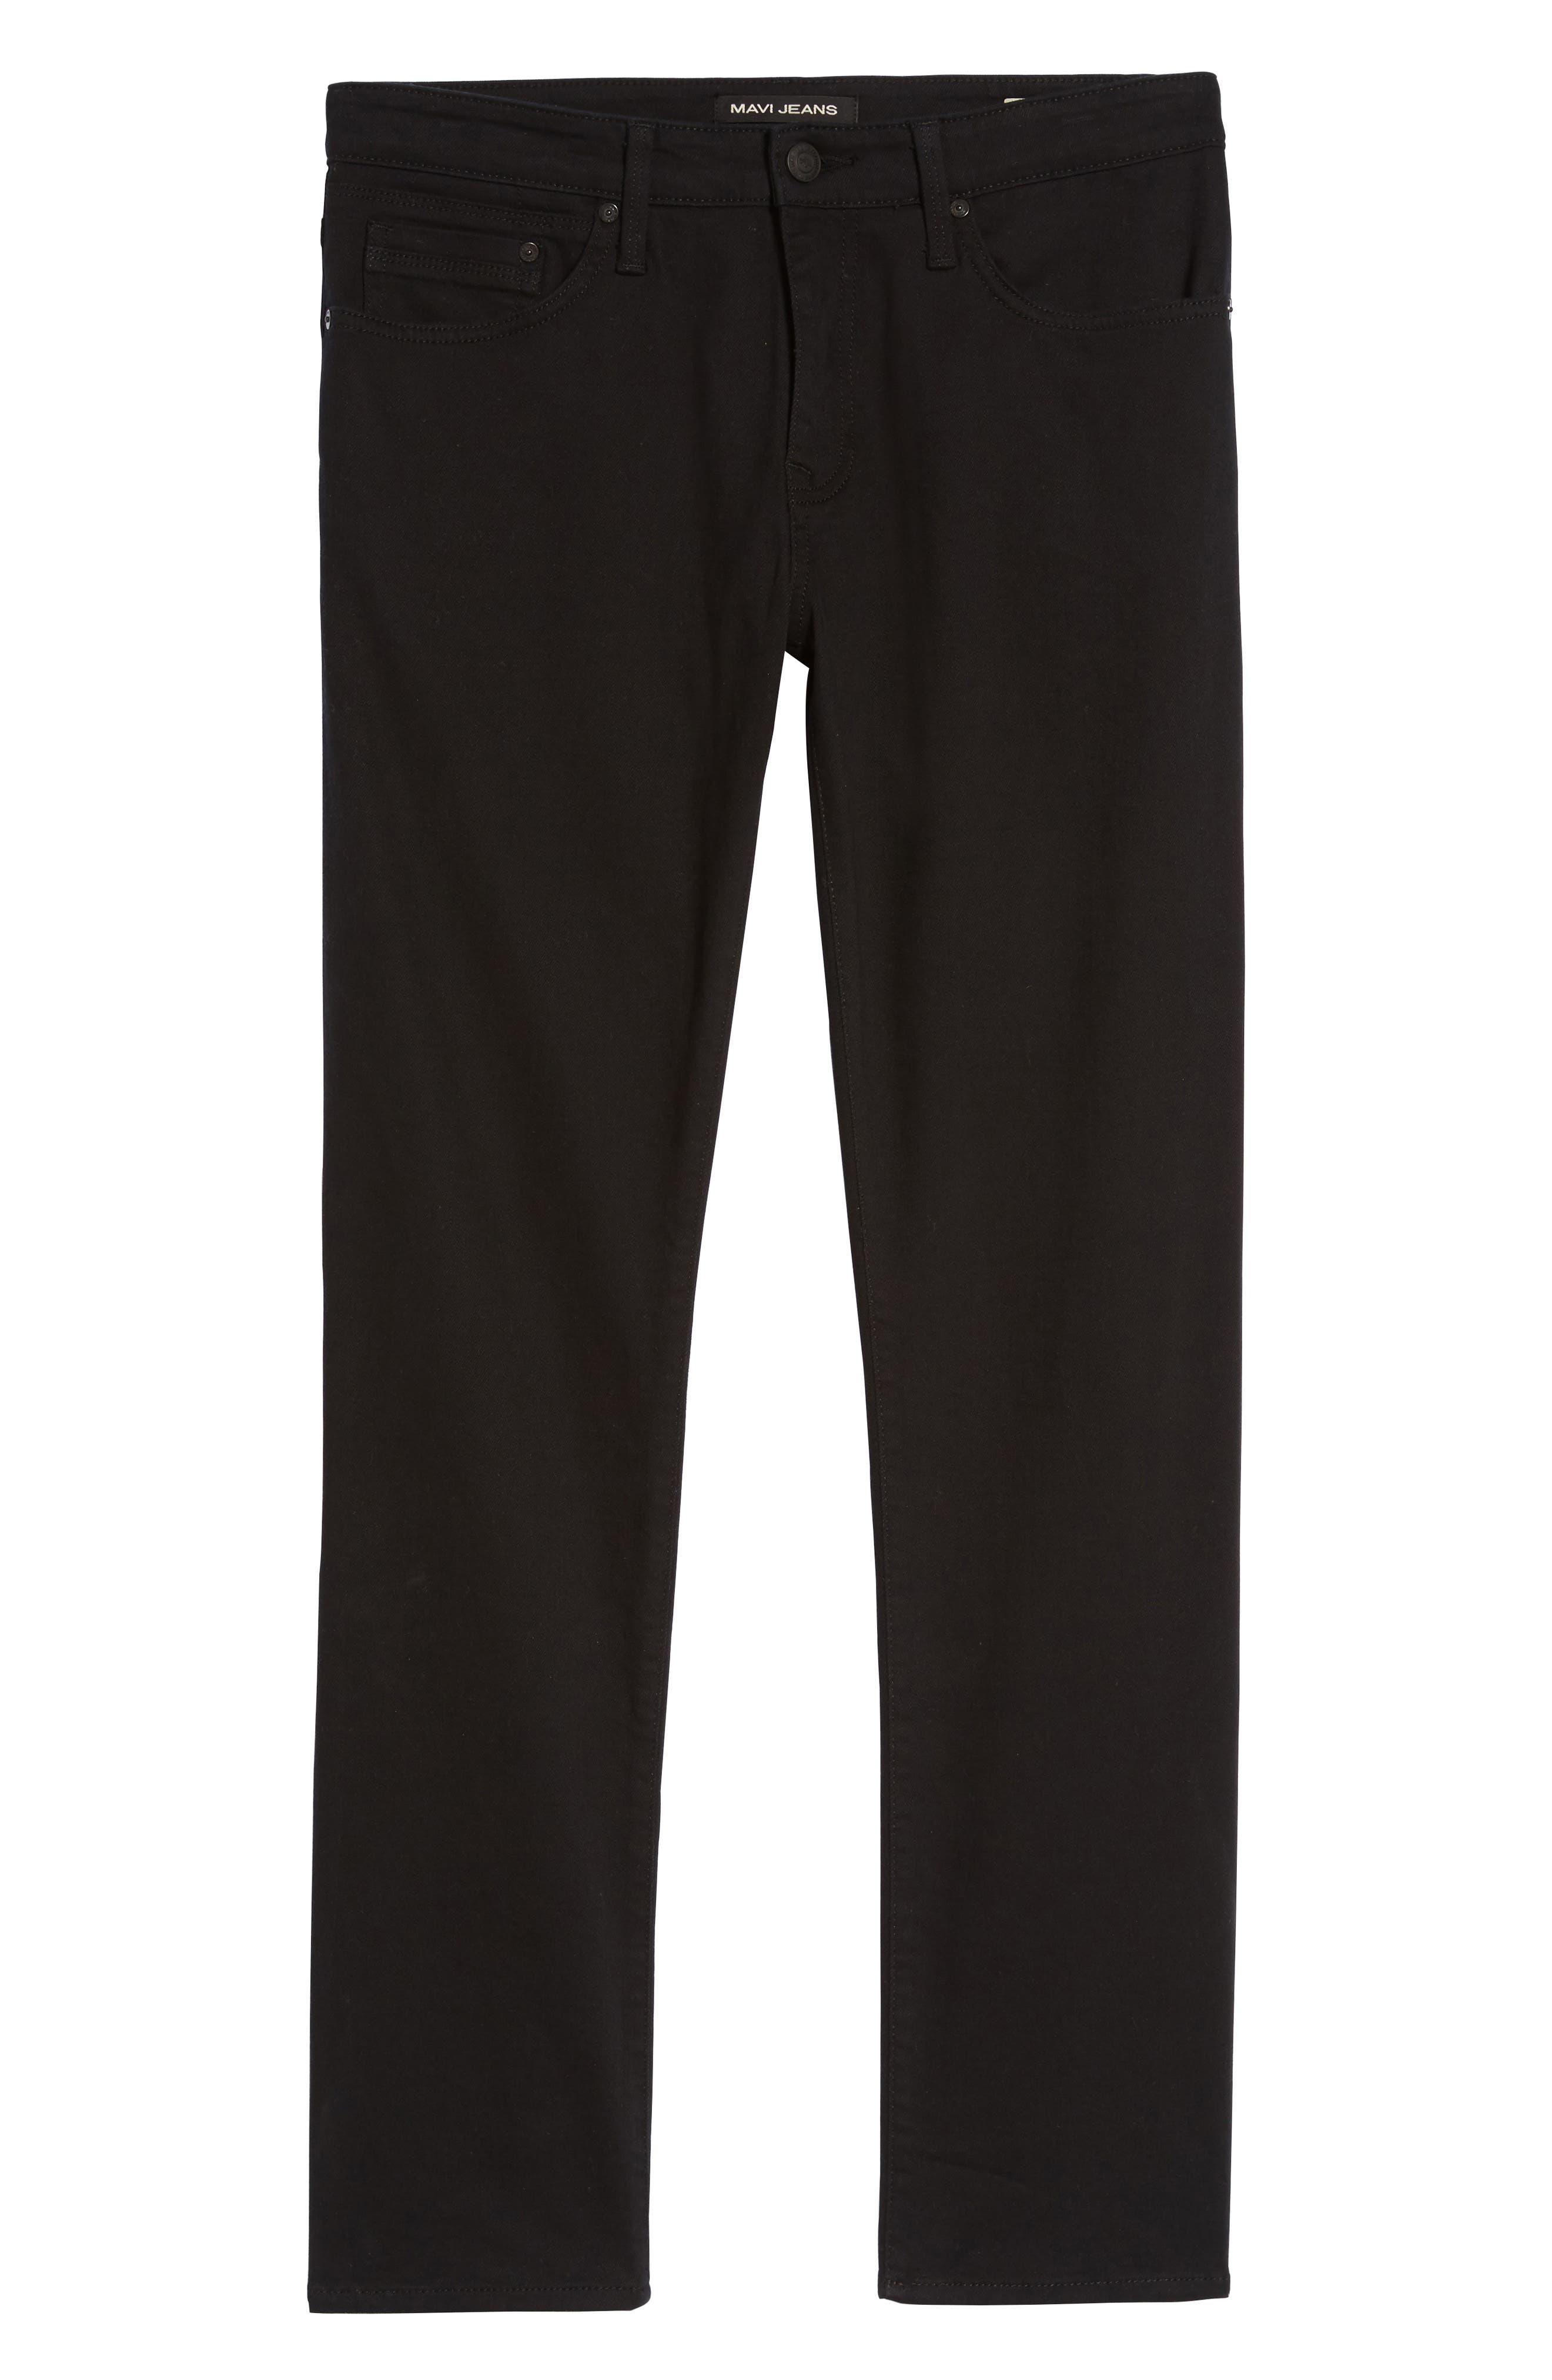 Zach Straight Leg Jeans,                             Alternate thumbnail 6, color,                             BLACK WILLIAMSBURG